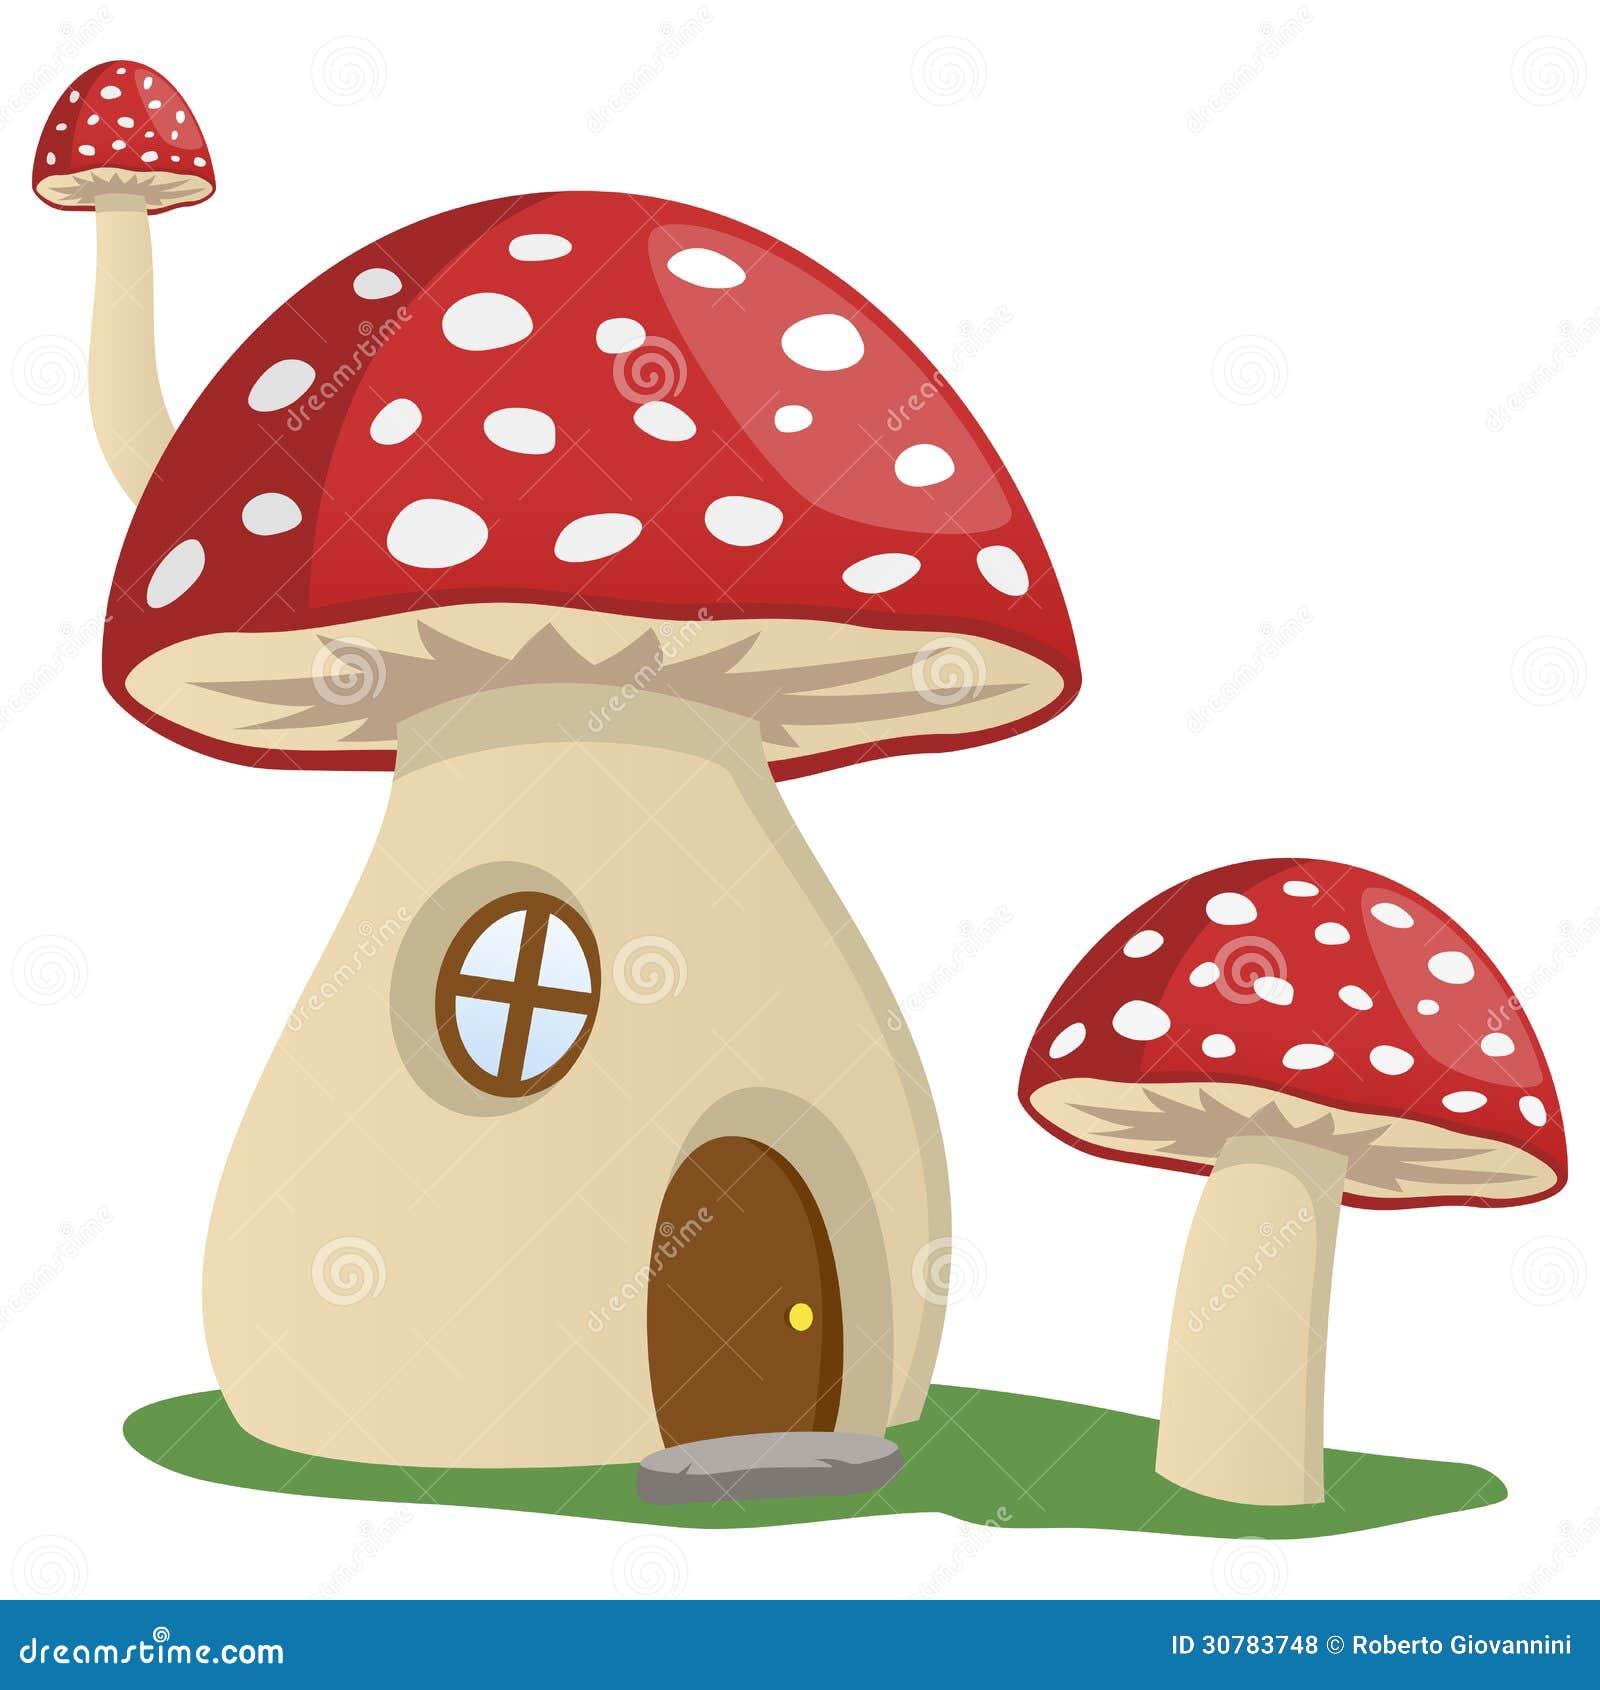 Free Clipart Of Mushroom